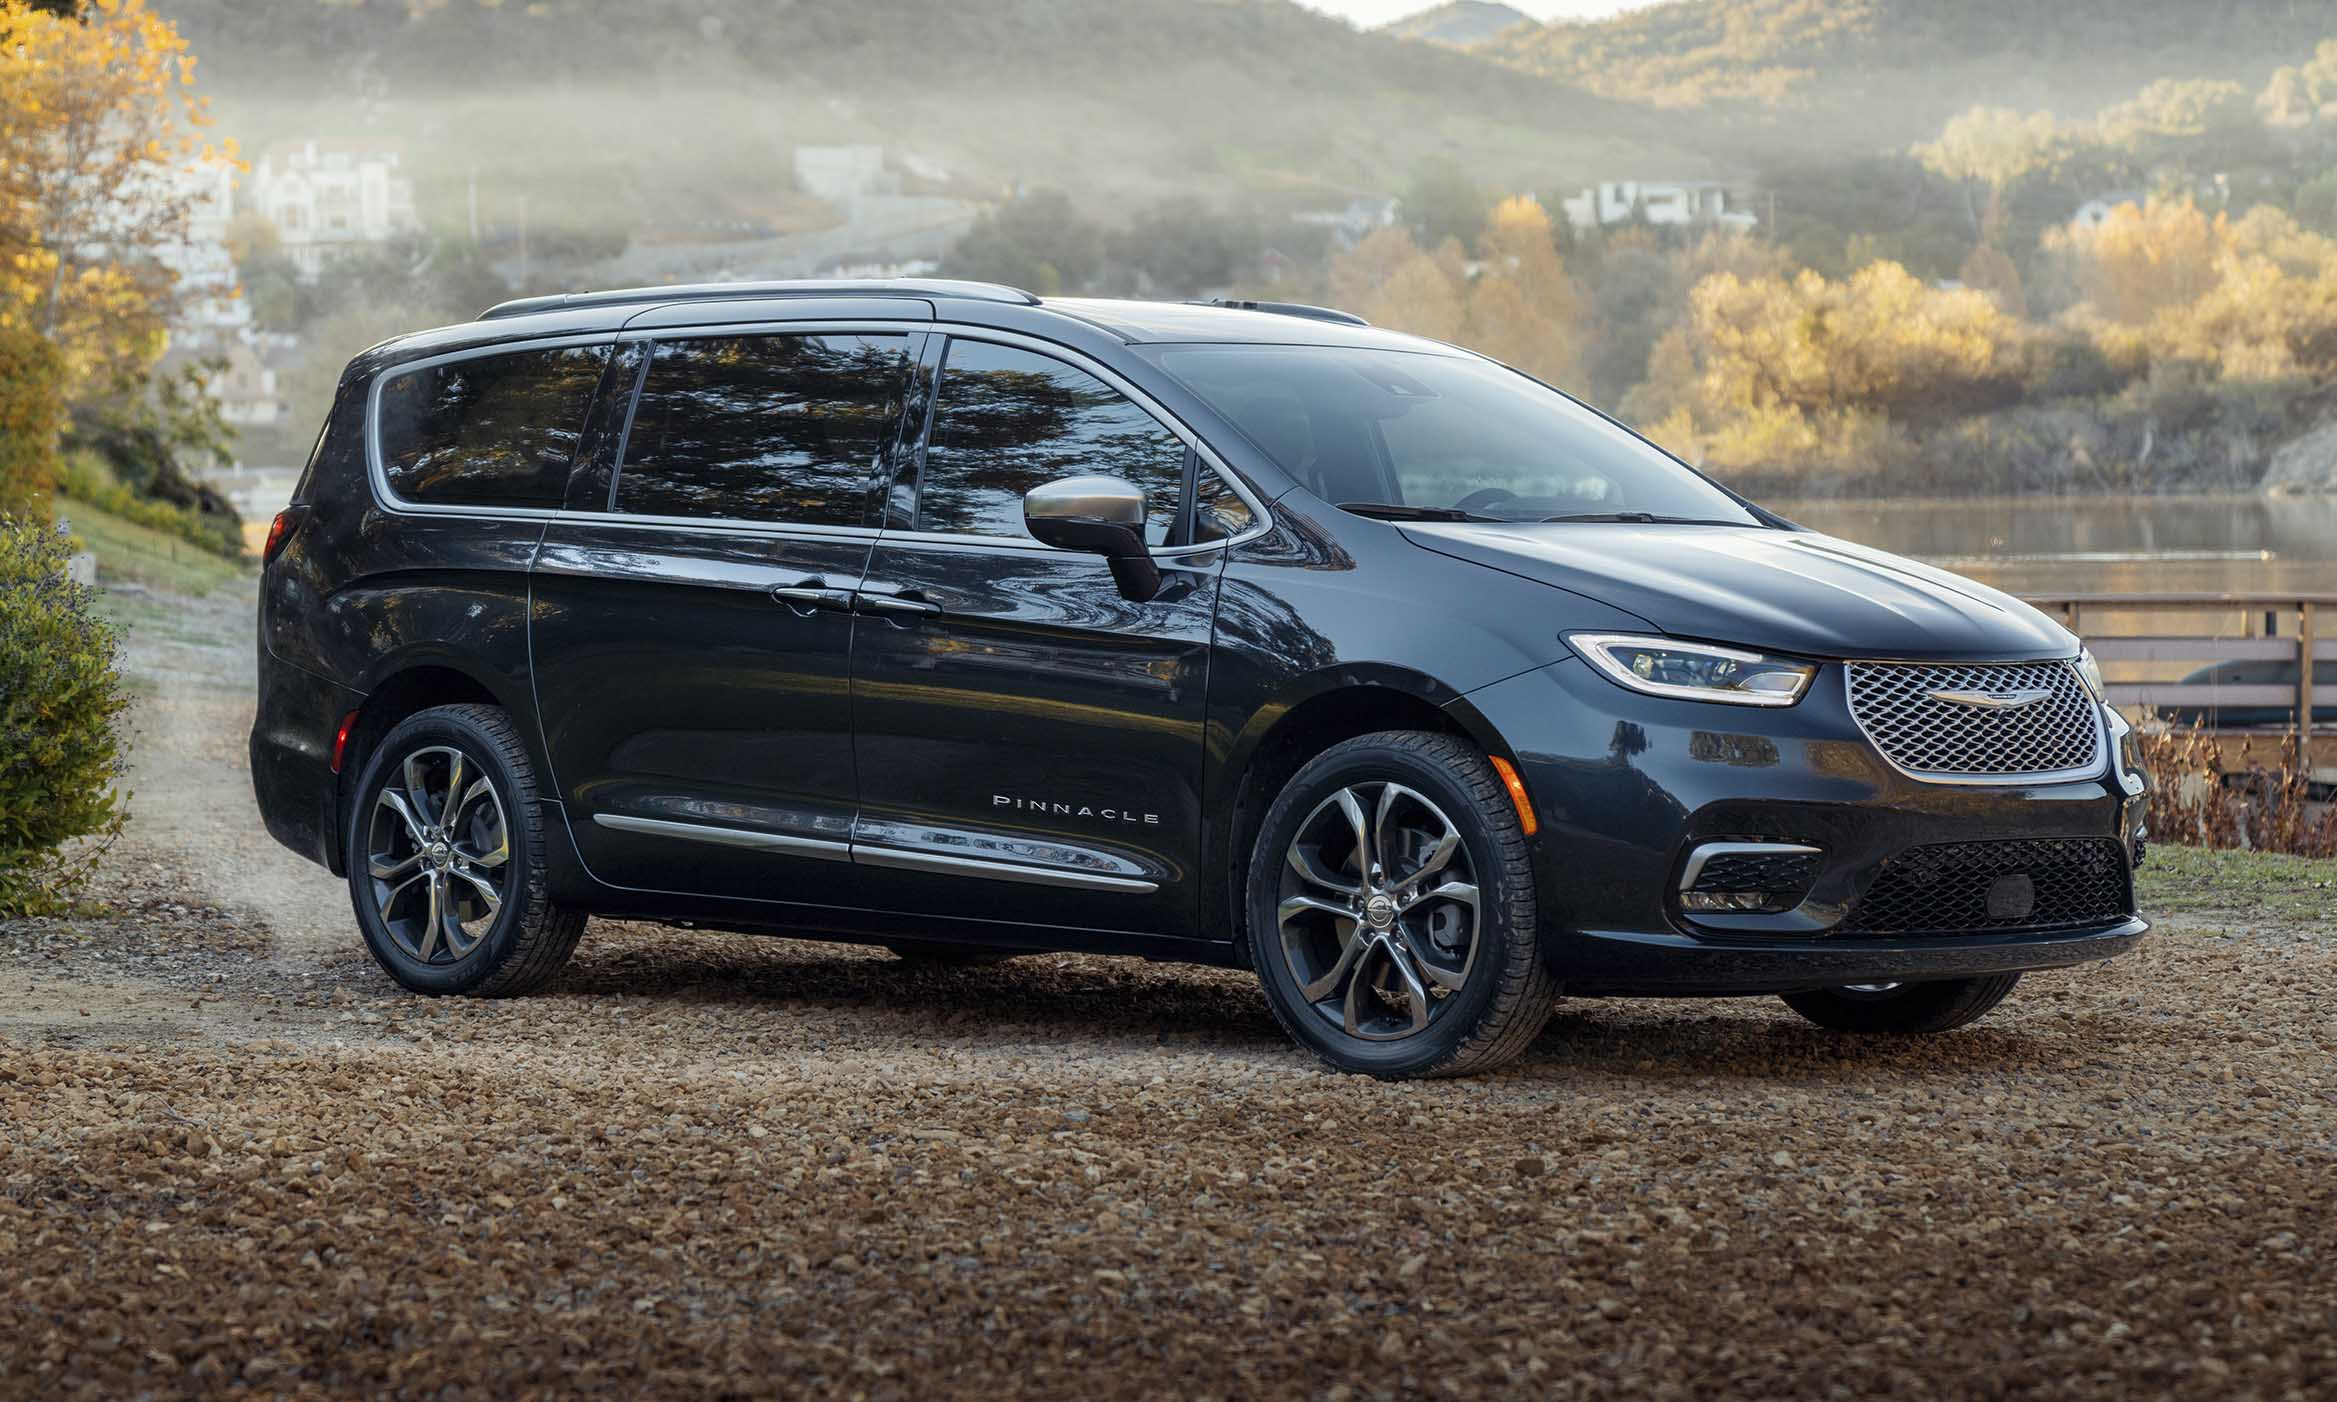 2021 Chrysler Pacifica First Looknbsp